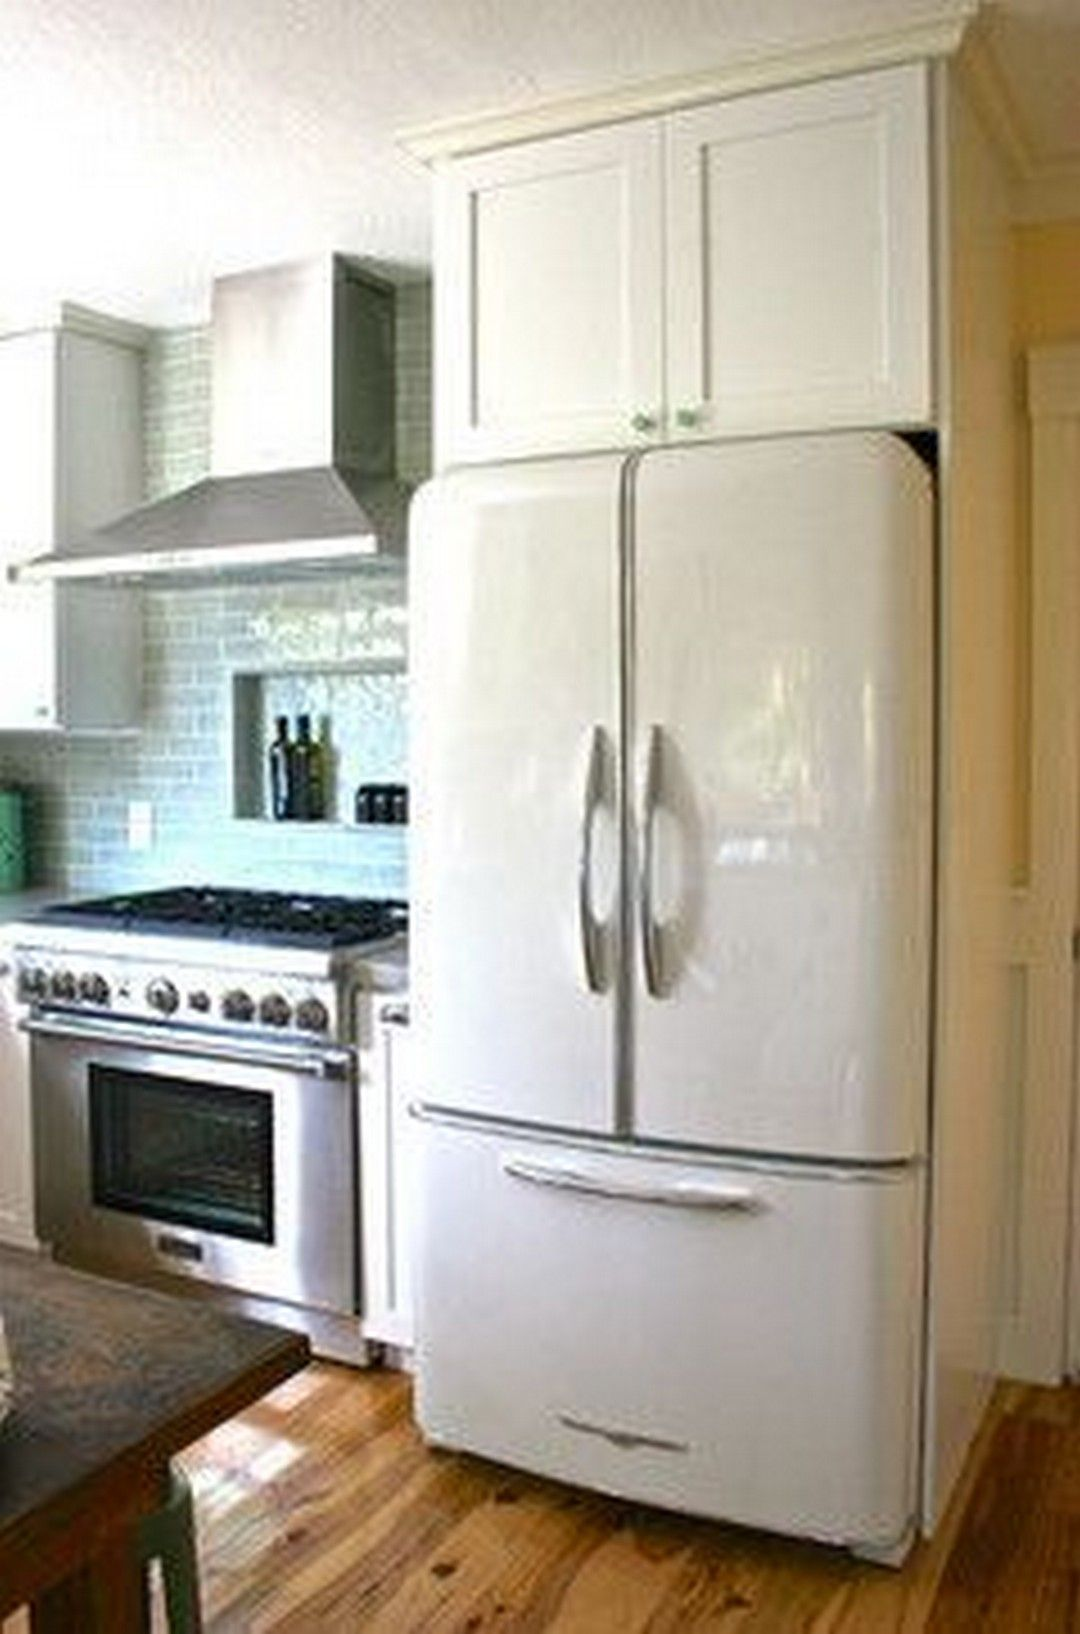 Vintage Style Kitchen Appliance Product and Design - Onechitecture #vintagekitchen